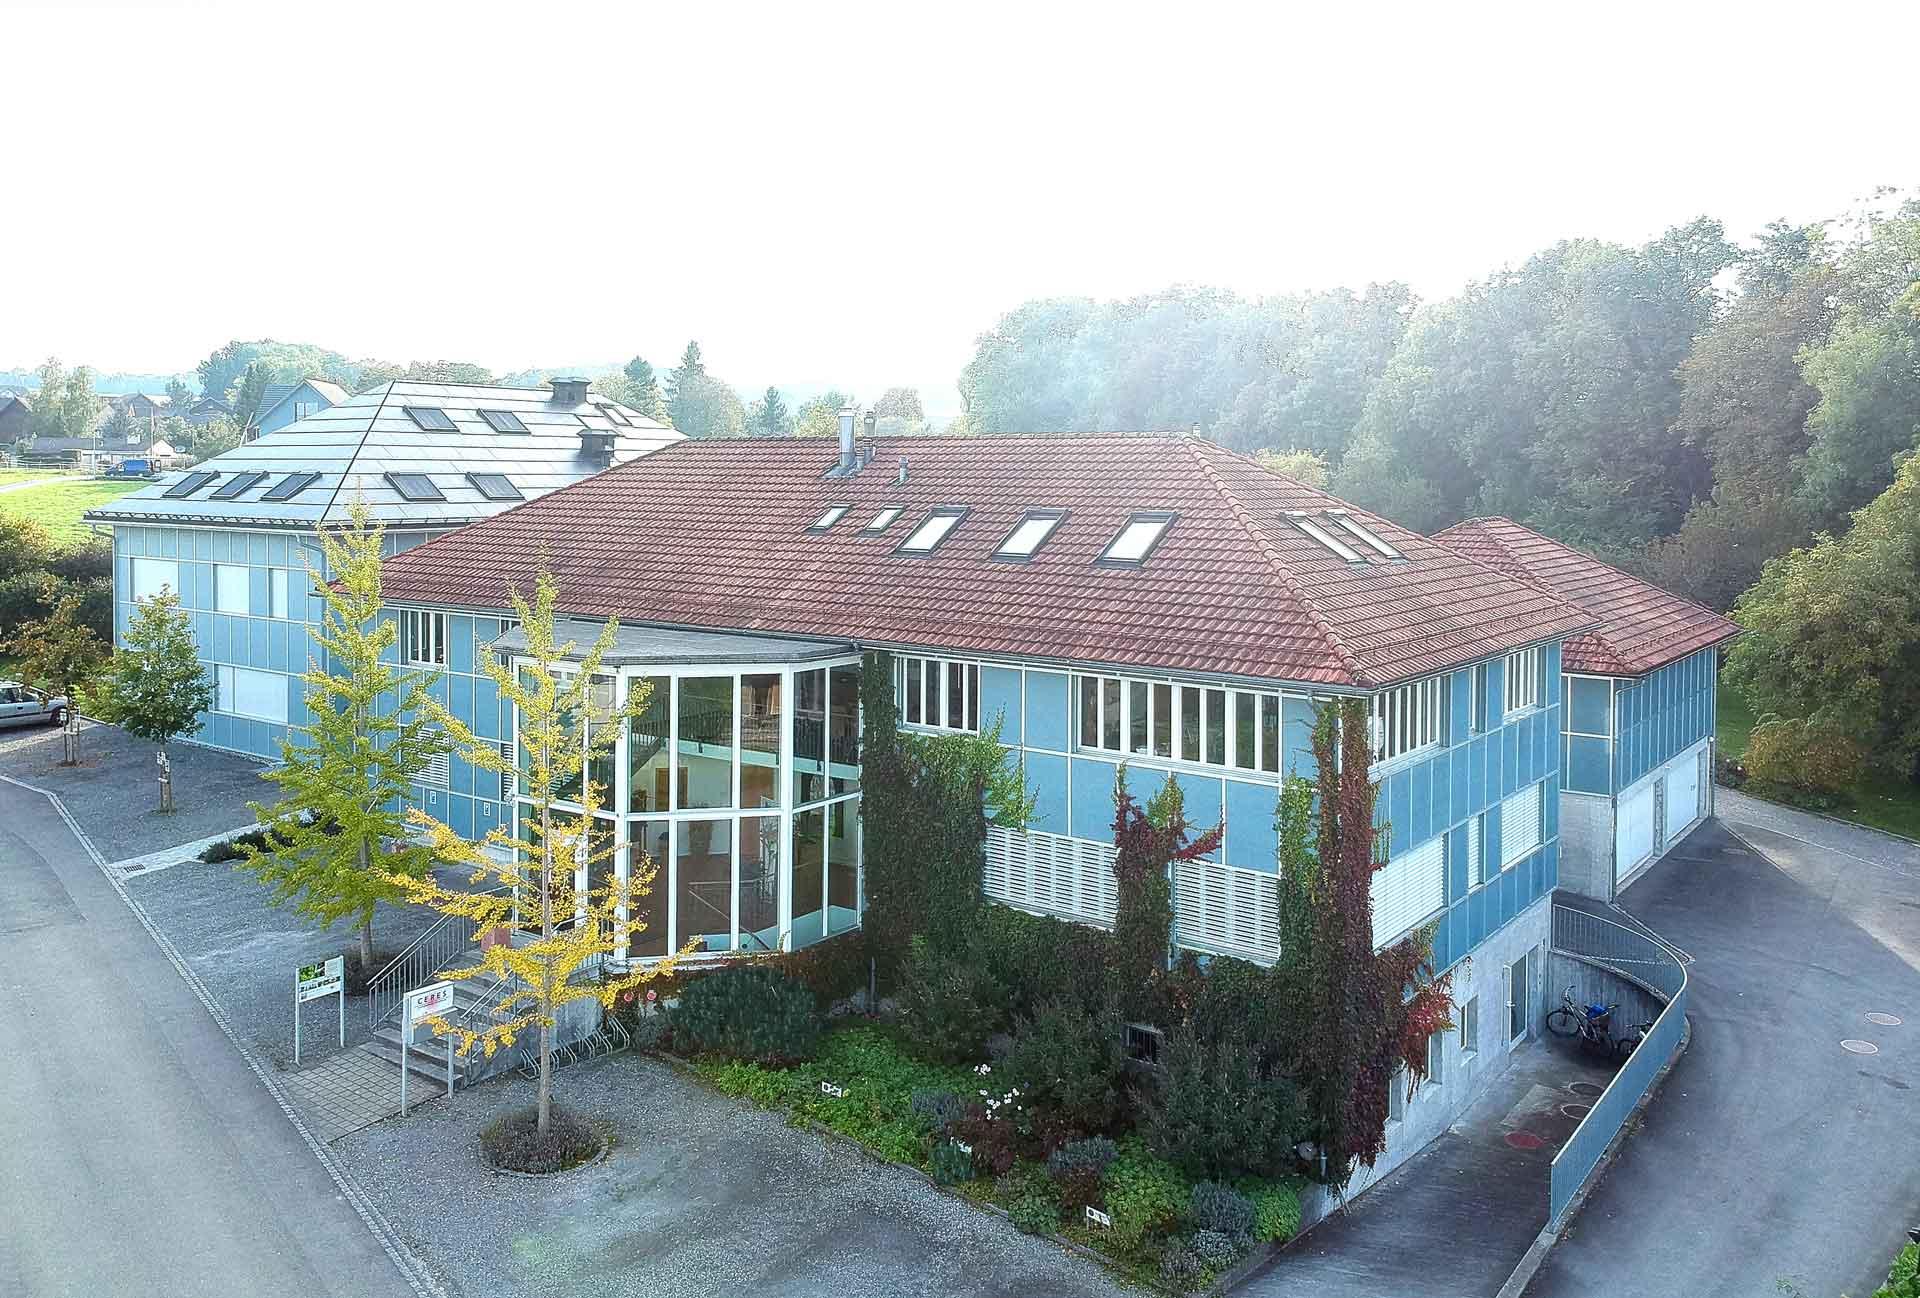 Ceres Firmengebäude Kesswil